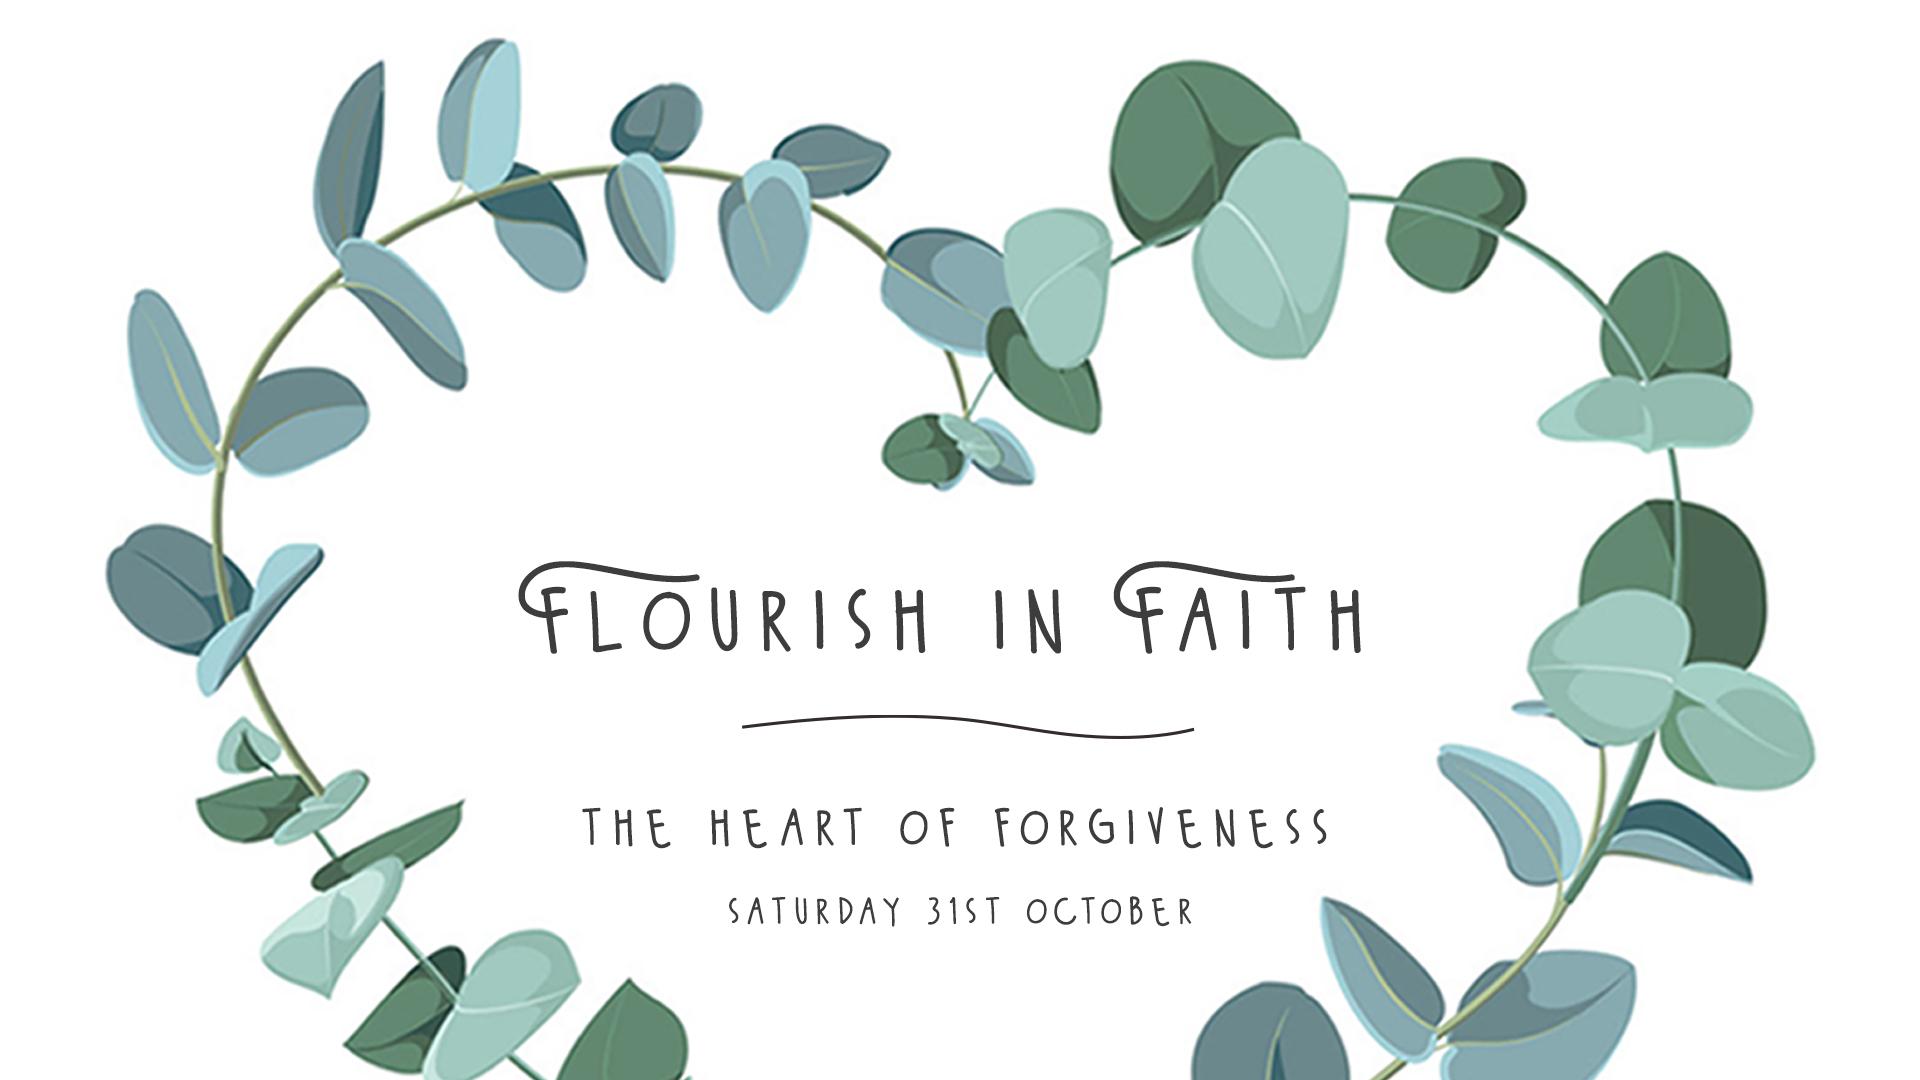 Flourish in Faith: The Heart of Forgiveness